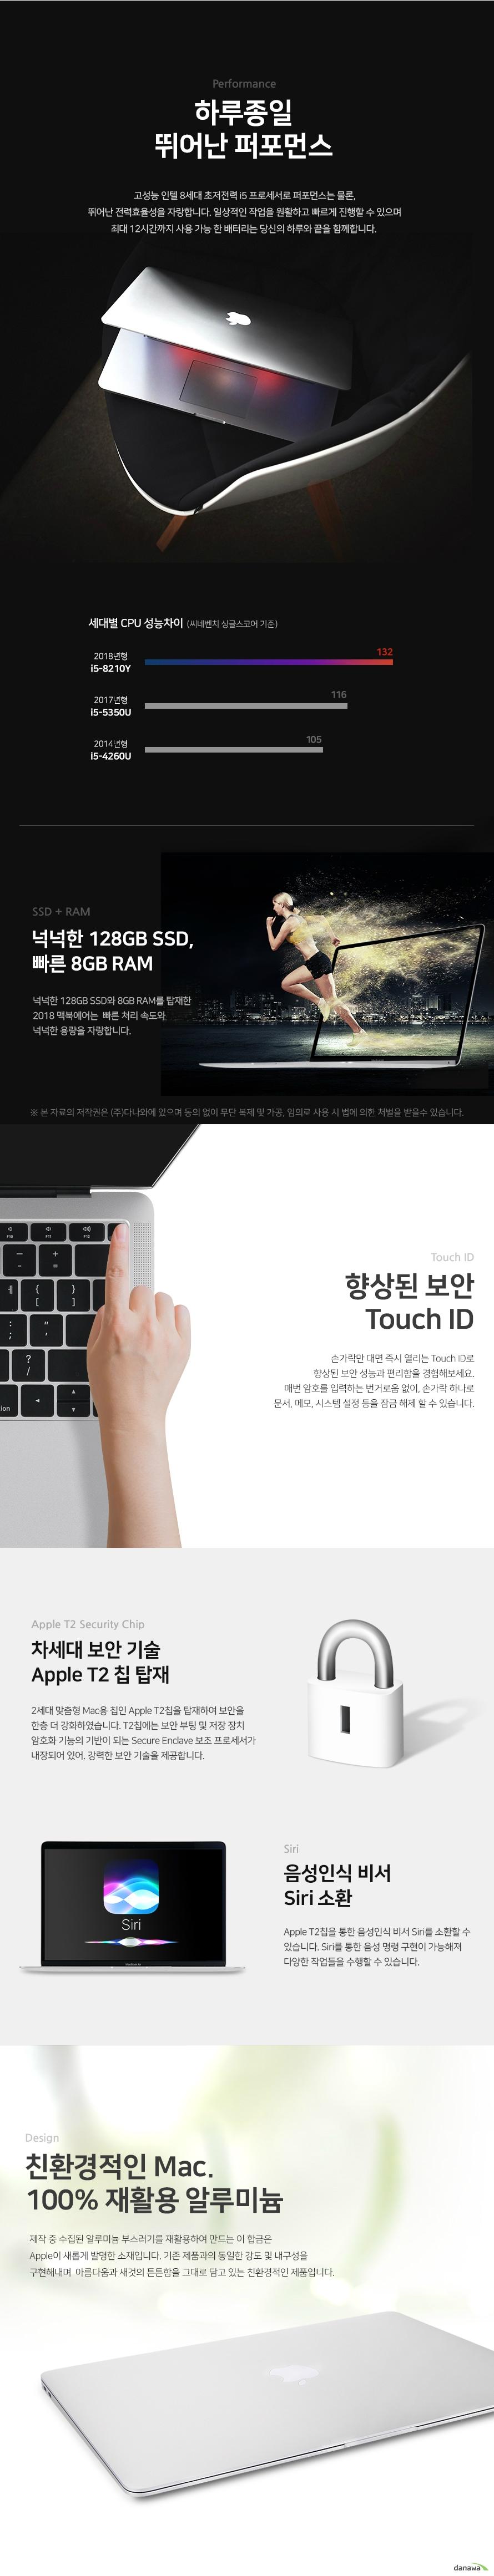 APPLE 맥북에어 2018년형 MREA2KH/A (SSD 128GB)